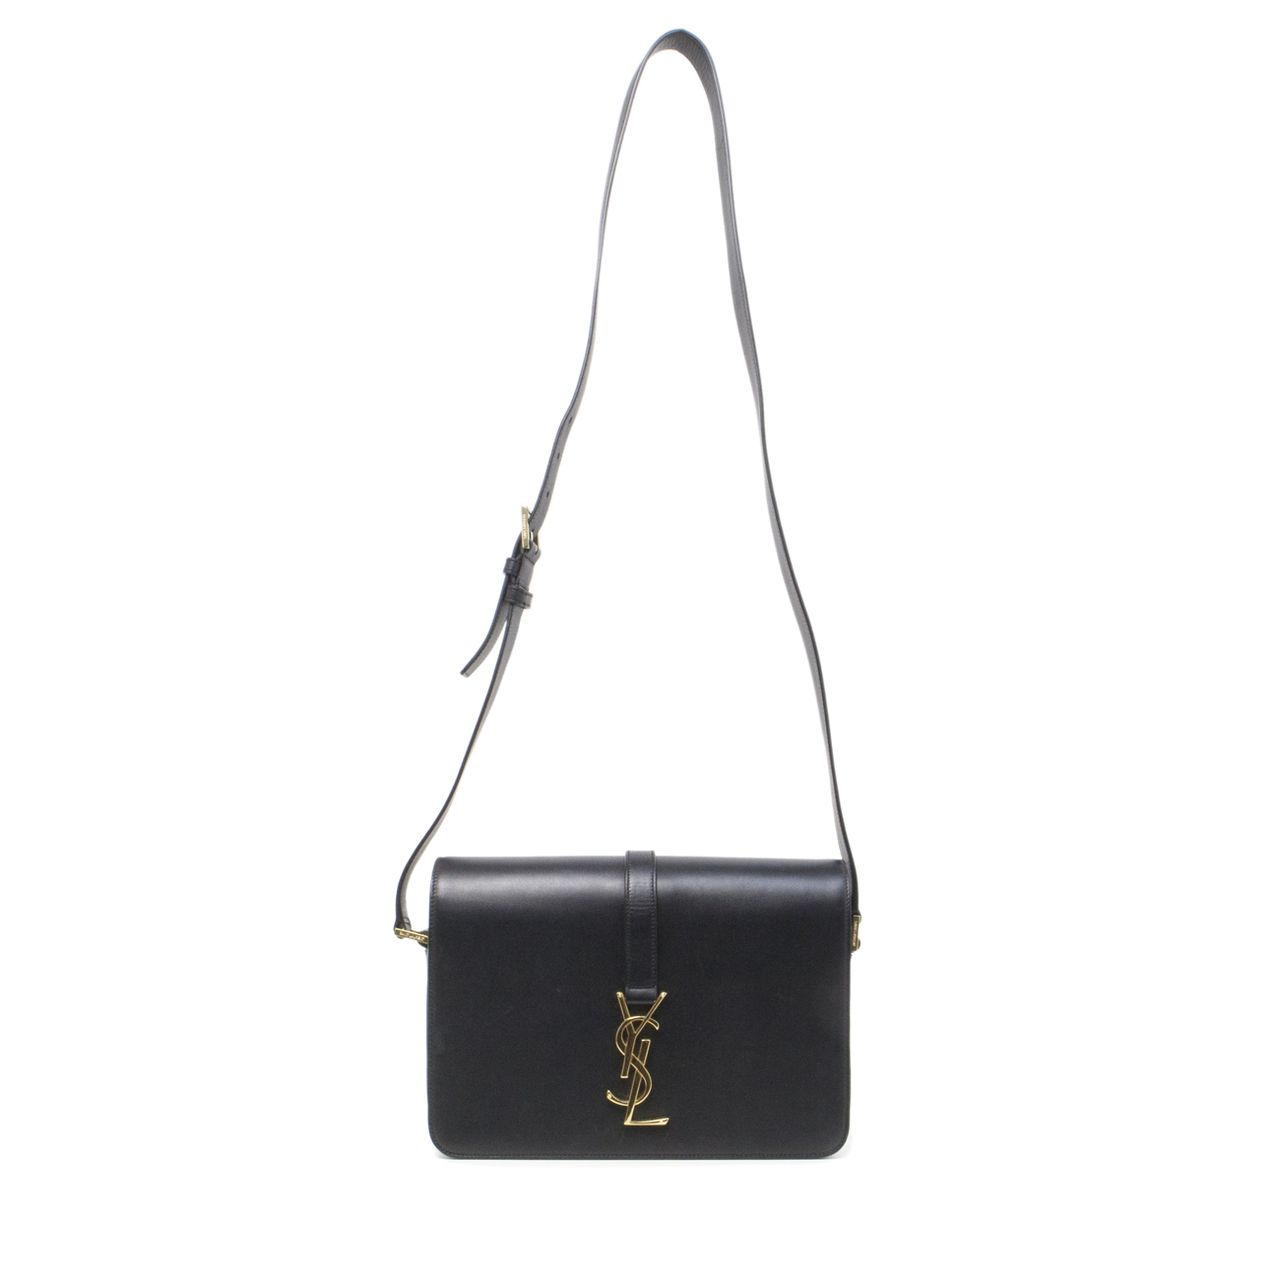 745876d843fbf Saint Laurent Black Smooth Calfskin Monogram Sac Universite Medium Shoulder  Bag - modaselle